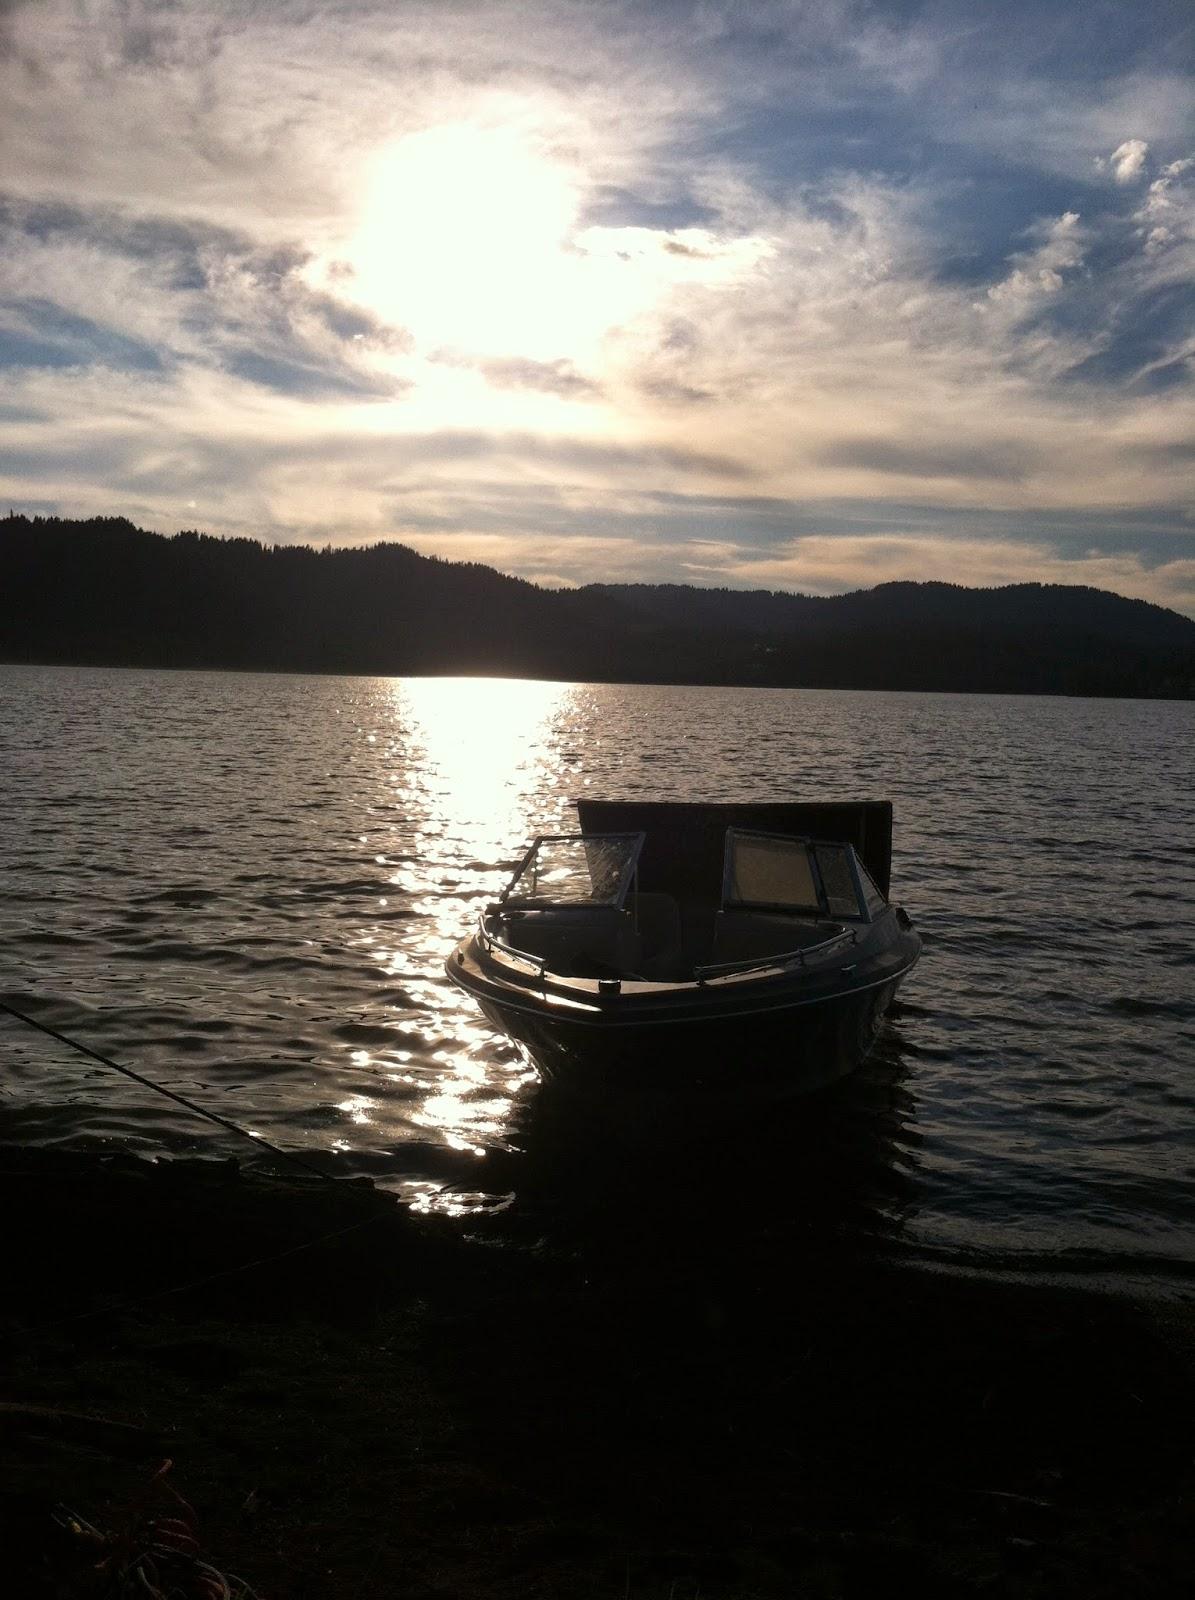 http://carolmgreen.blogspot.com/2014/07/another-story-about-boat.html